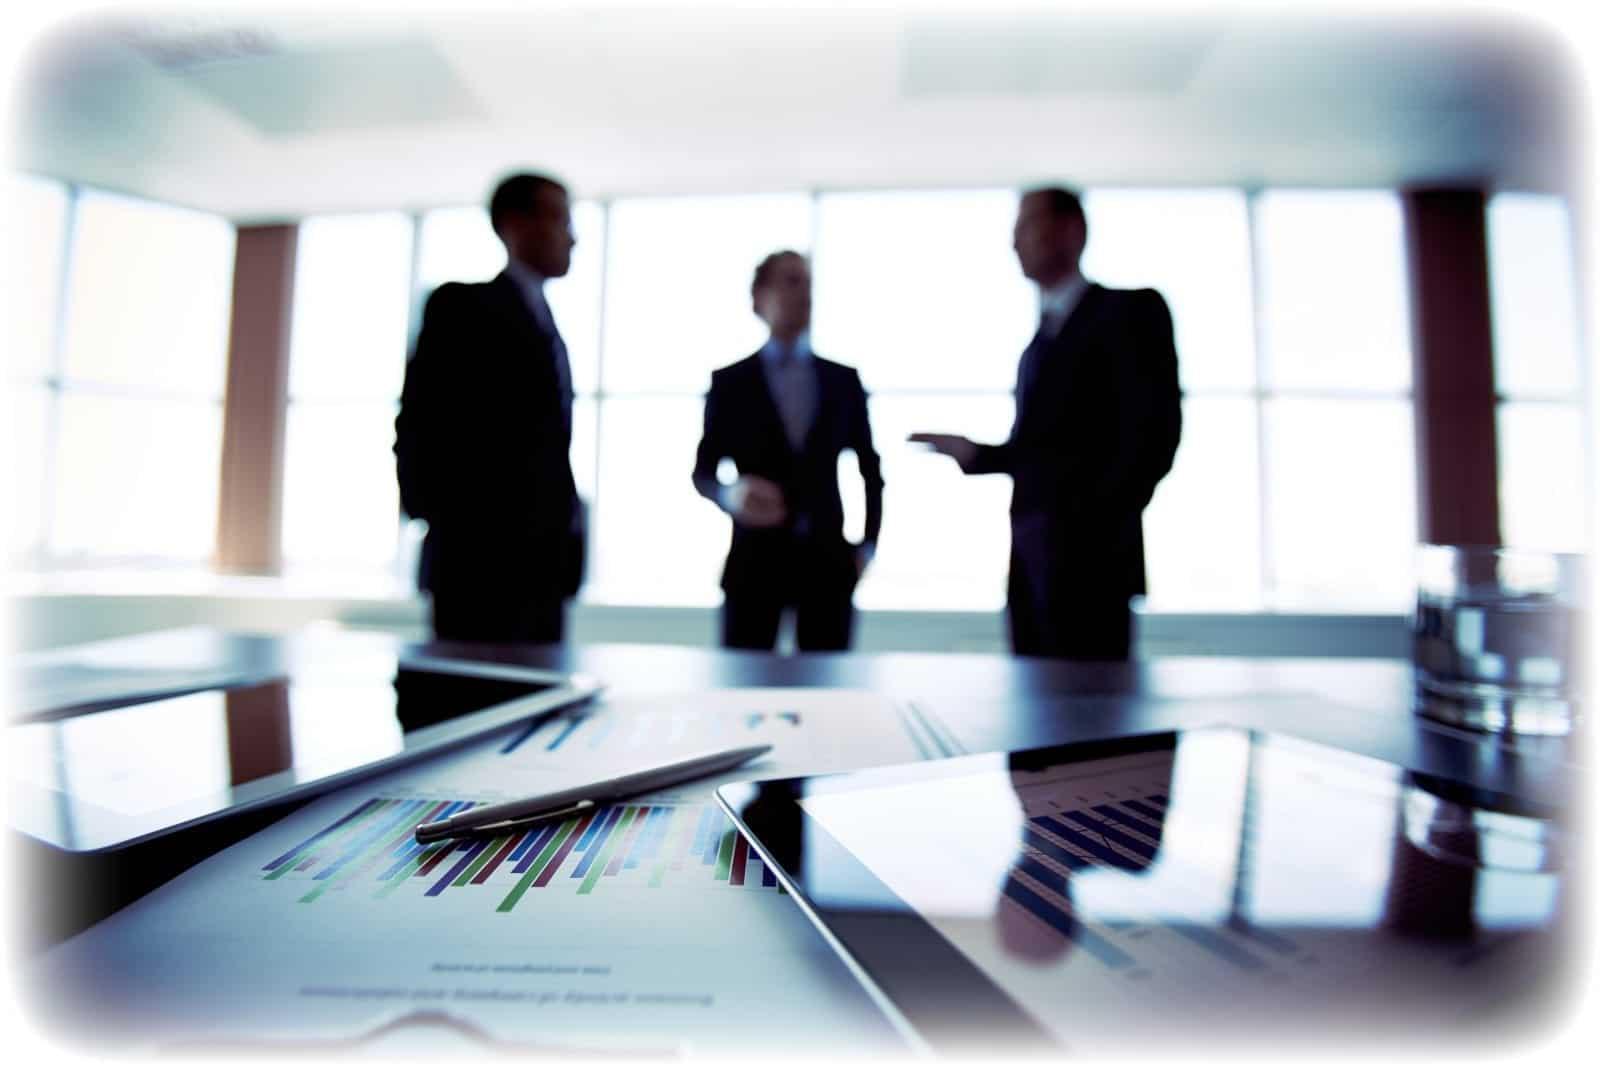 https://www.mbersanilaw.com/wp-content/uploads/2018/08/meeting-boardroom-professionals-1.jpg